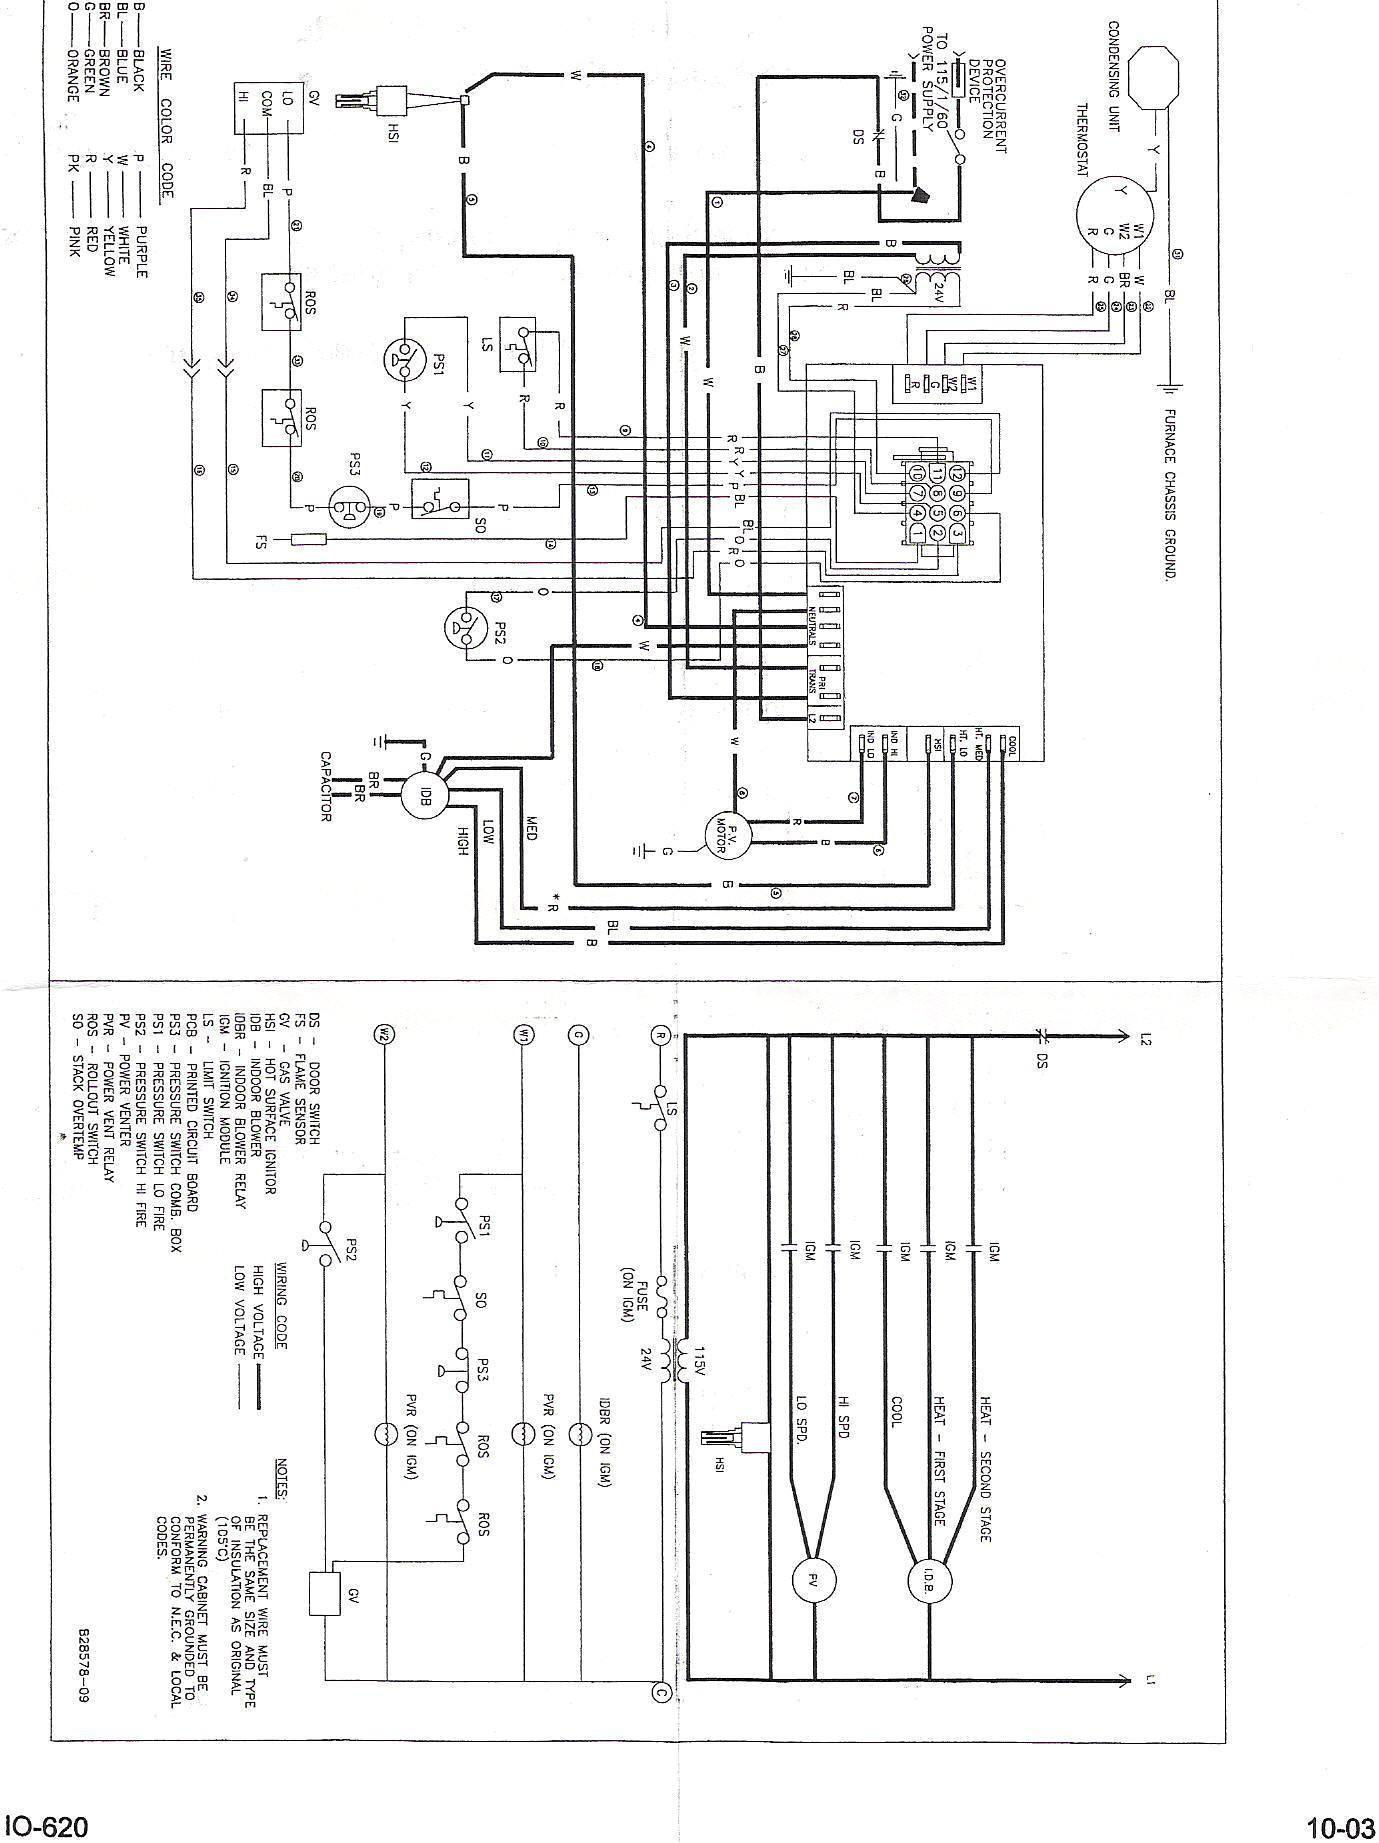 hight resolution of first pany air handler wiring diagram 2018 ruud air handler wiring diagram 2018 endearing enchanting 8